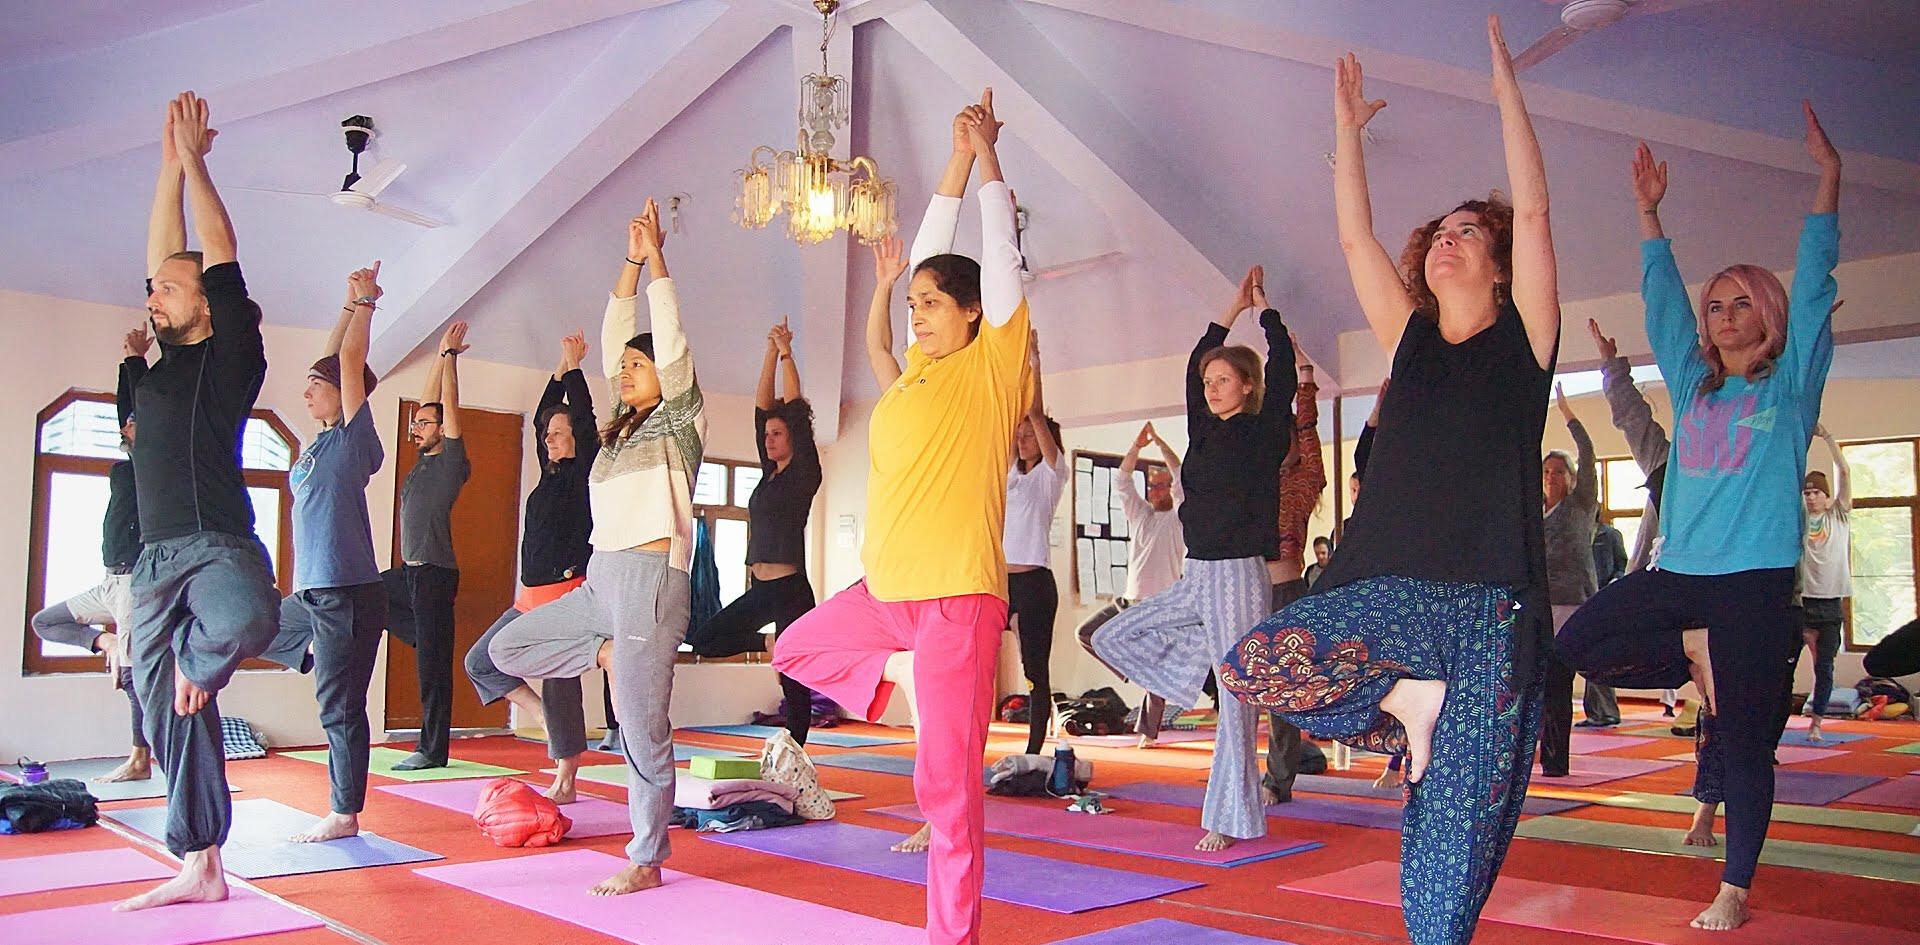 Yoga Practice in the Yoga Hall at Phool Chatti Ashram